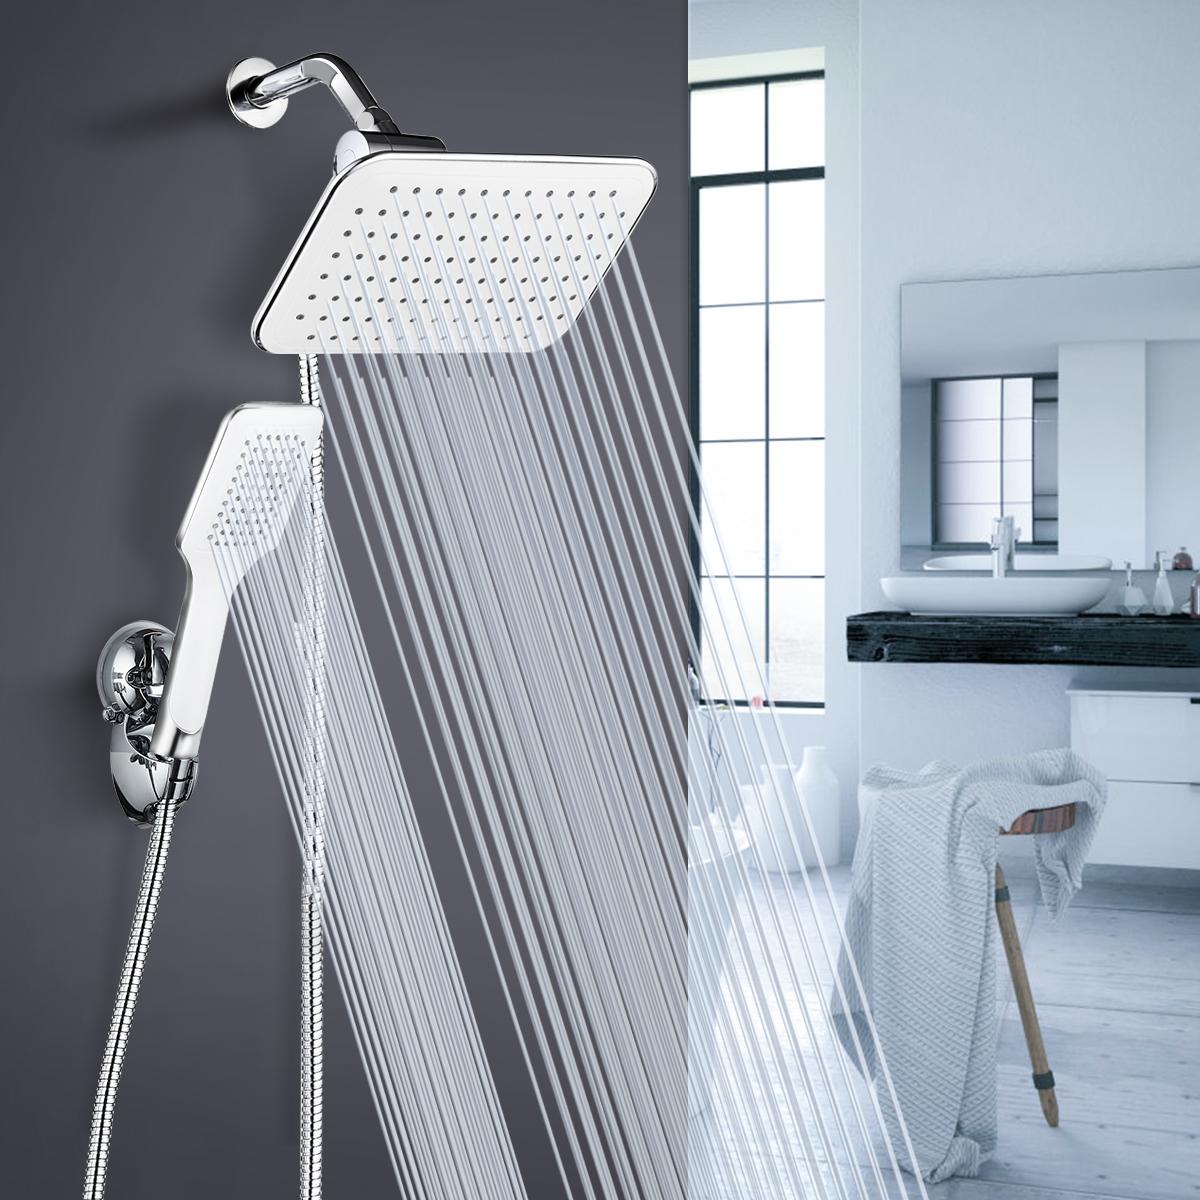 6Pcs 8 Inch Rainfall Shower Head Setting Large Angle-adjustable Shower Set